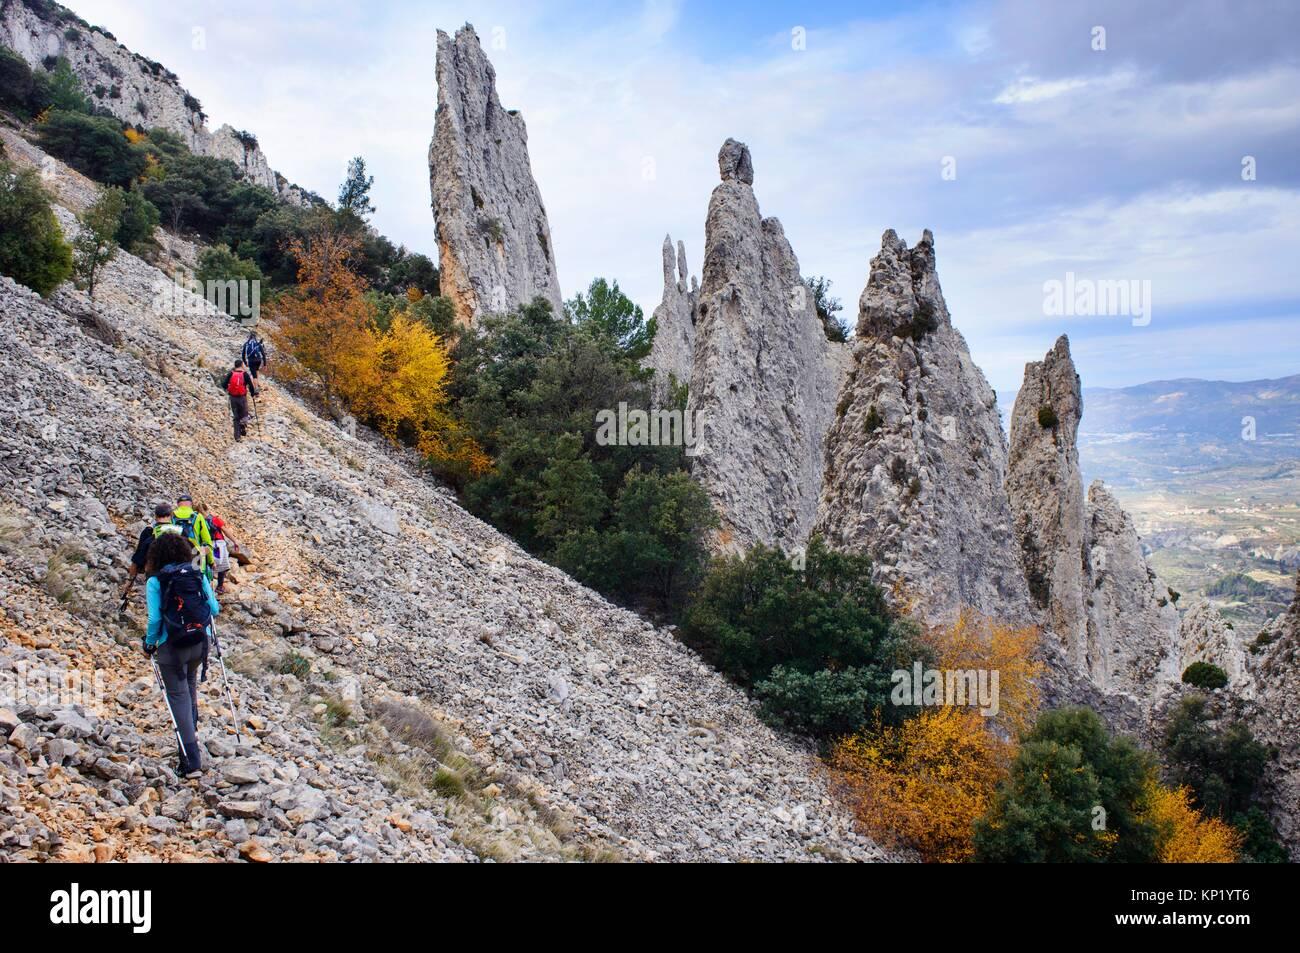 Walker walking the mountain, under the knives of the Quatretondeta Friars, Alicante, Valencia, Spain - Stock Image